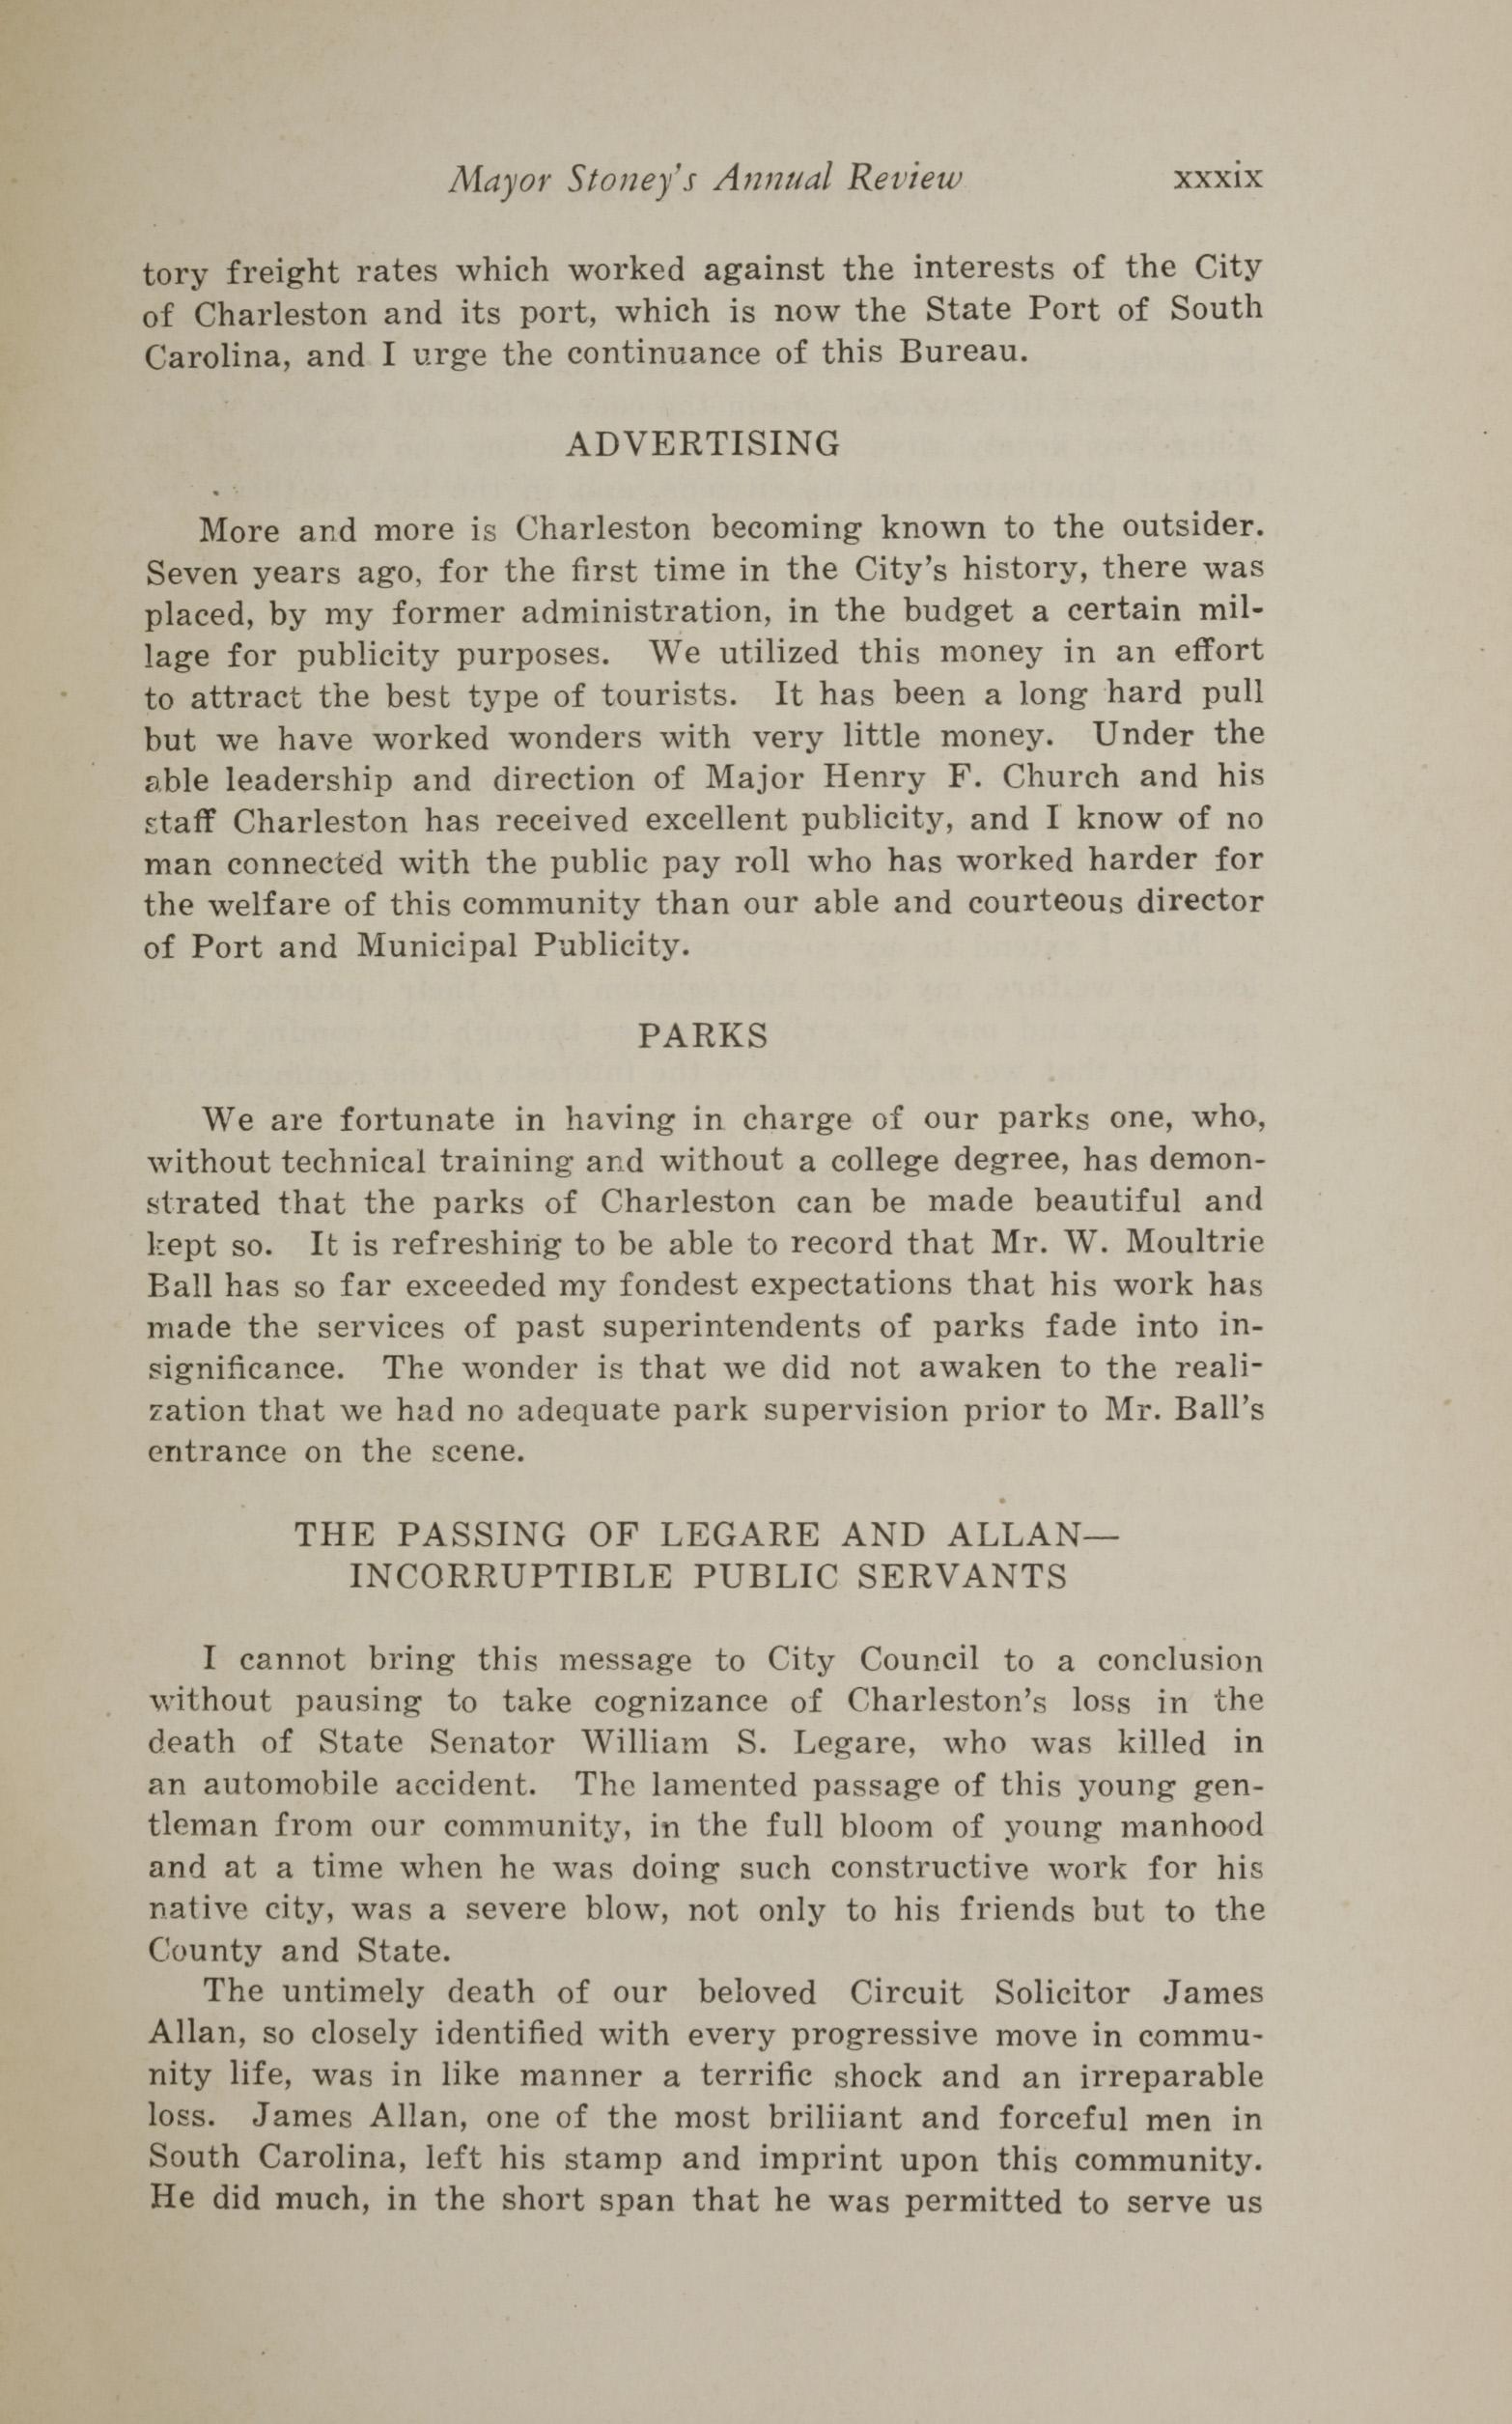 Charleston Yearbook, 1930, page xxxix